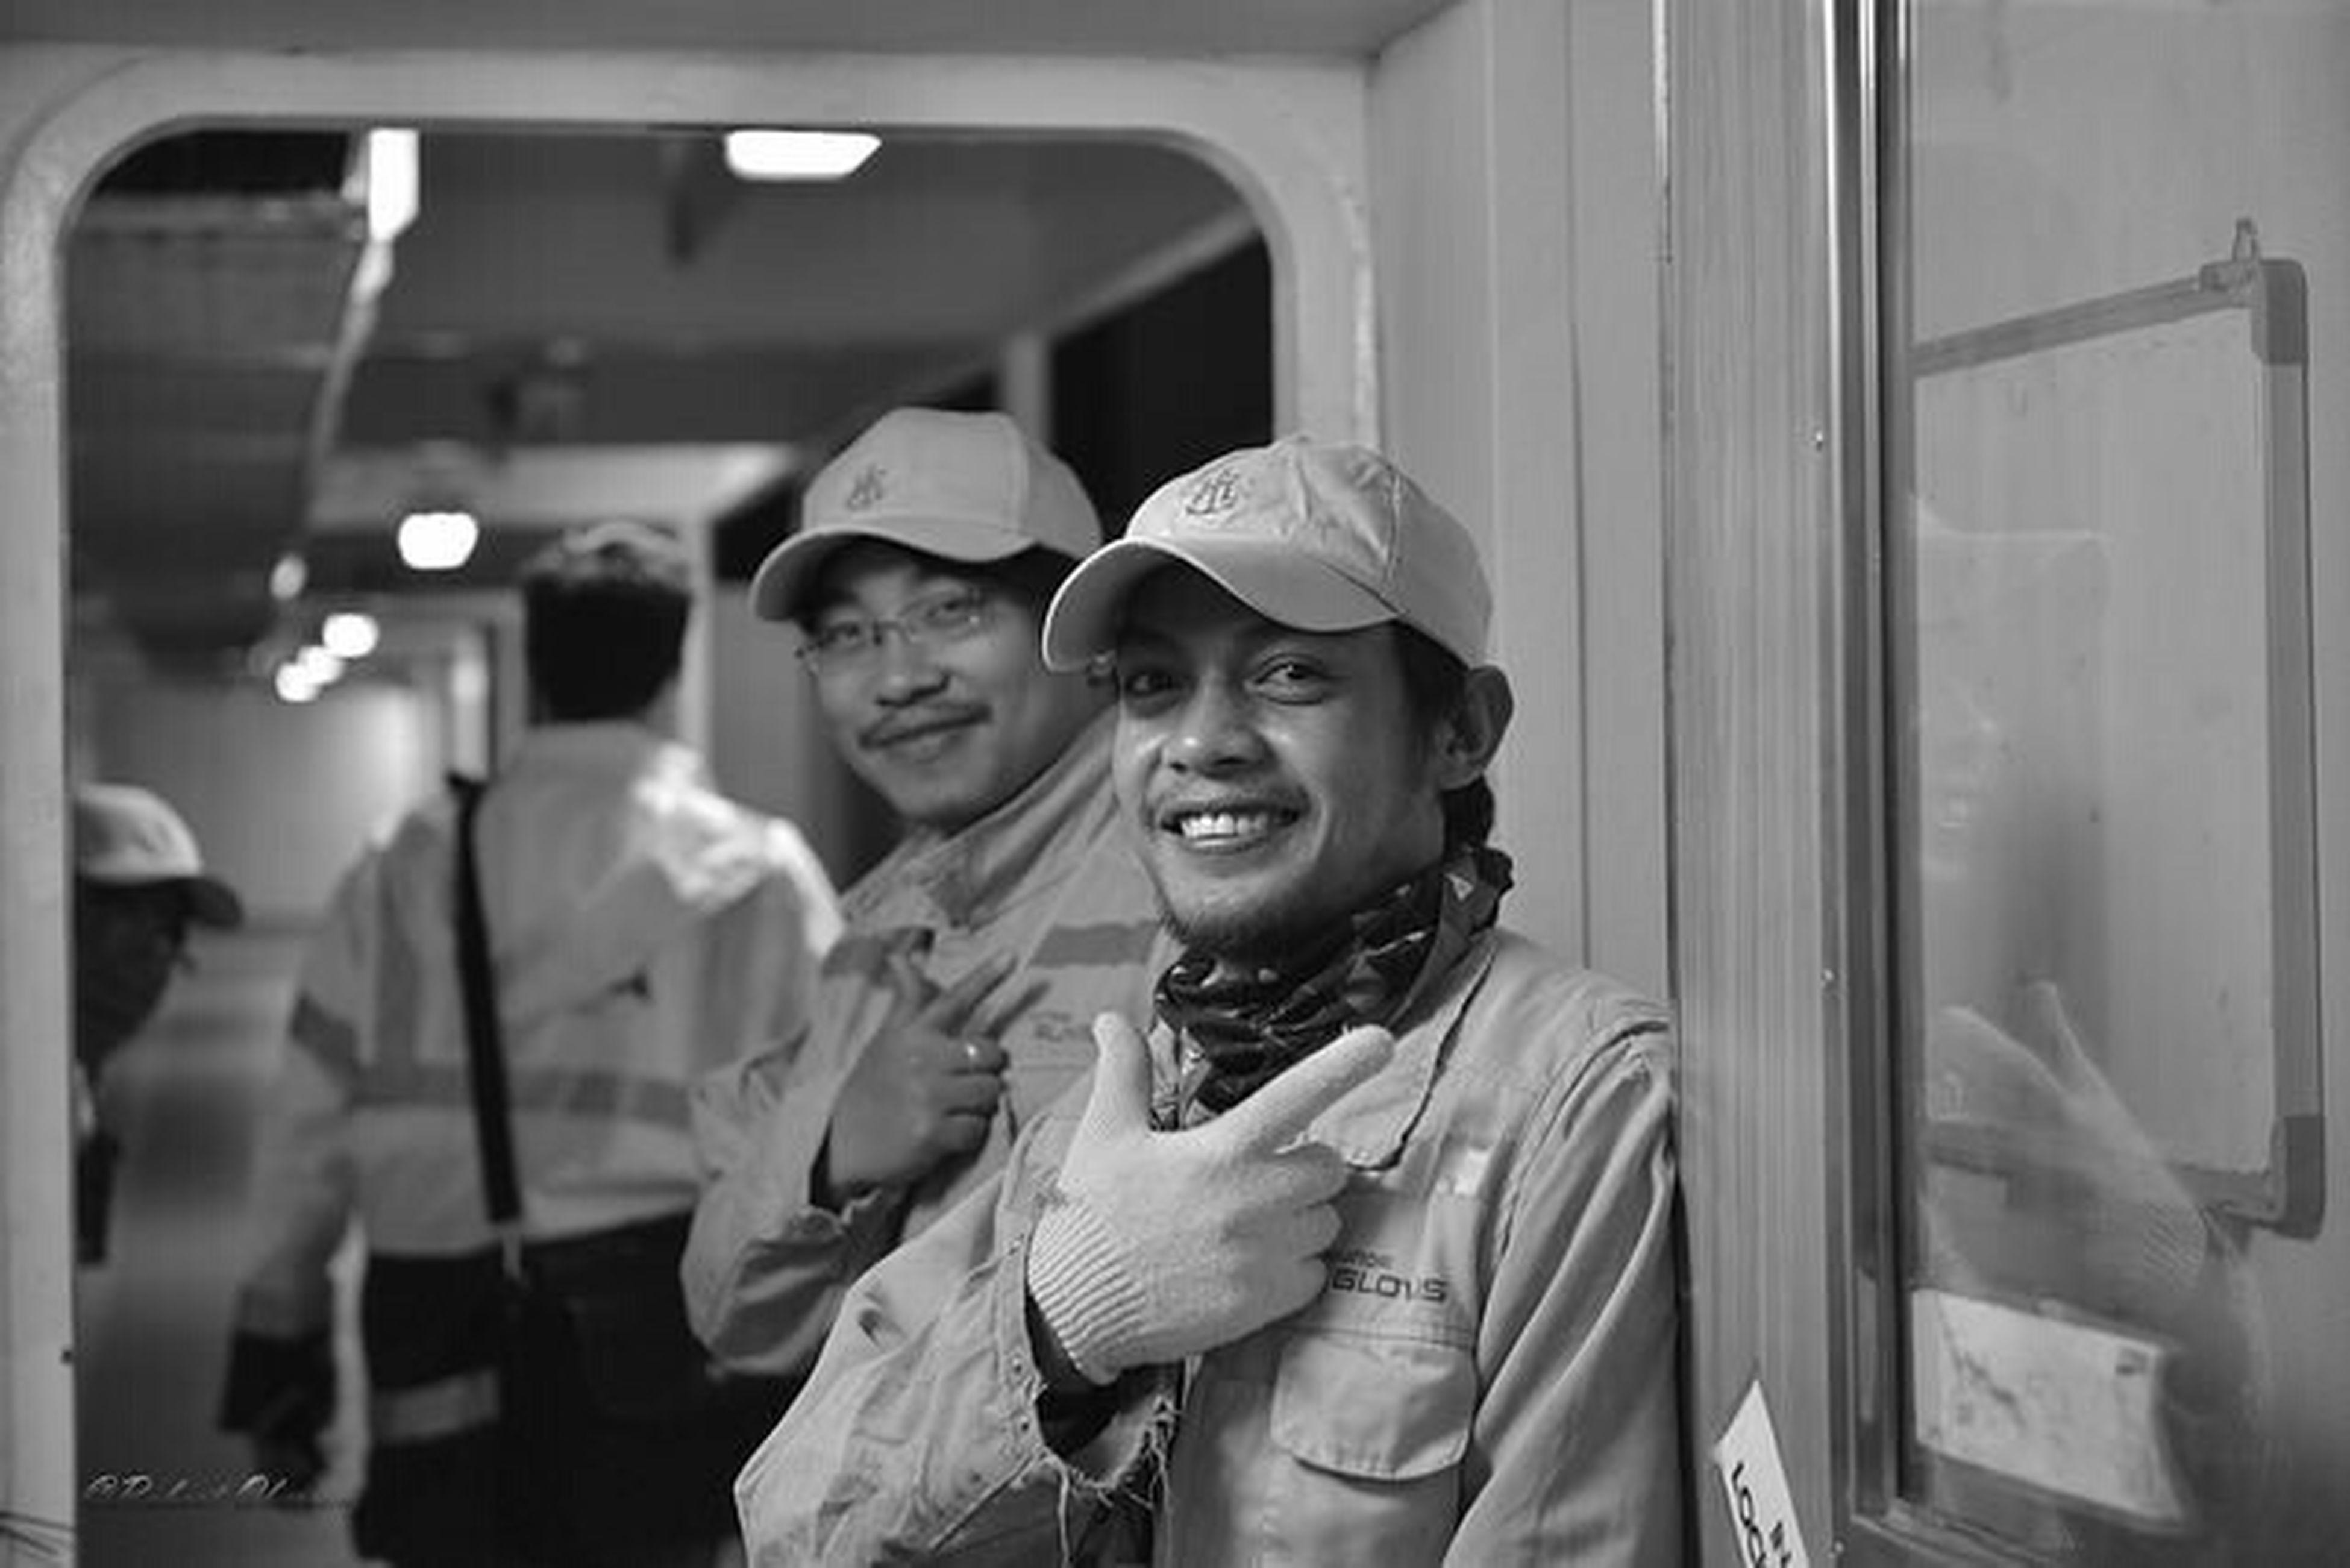 Taking pics on aCruise Ship in Antwerpen Black And White Bnw Portrait Tadda Community Open Edit Boat Life Happy Portrait